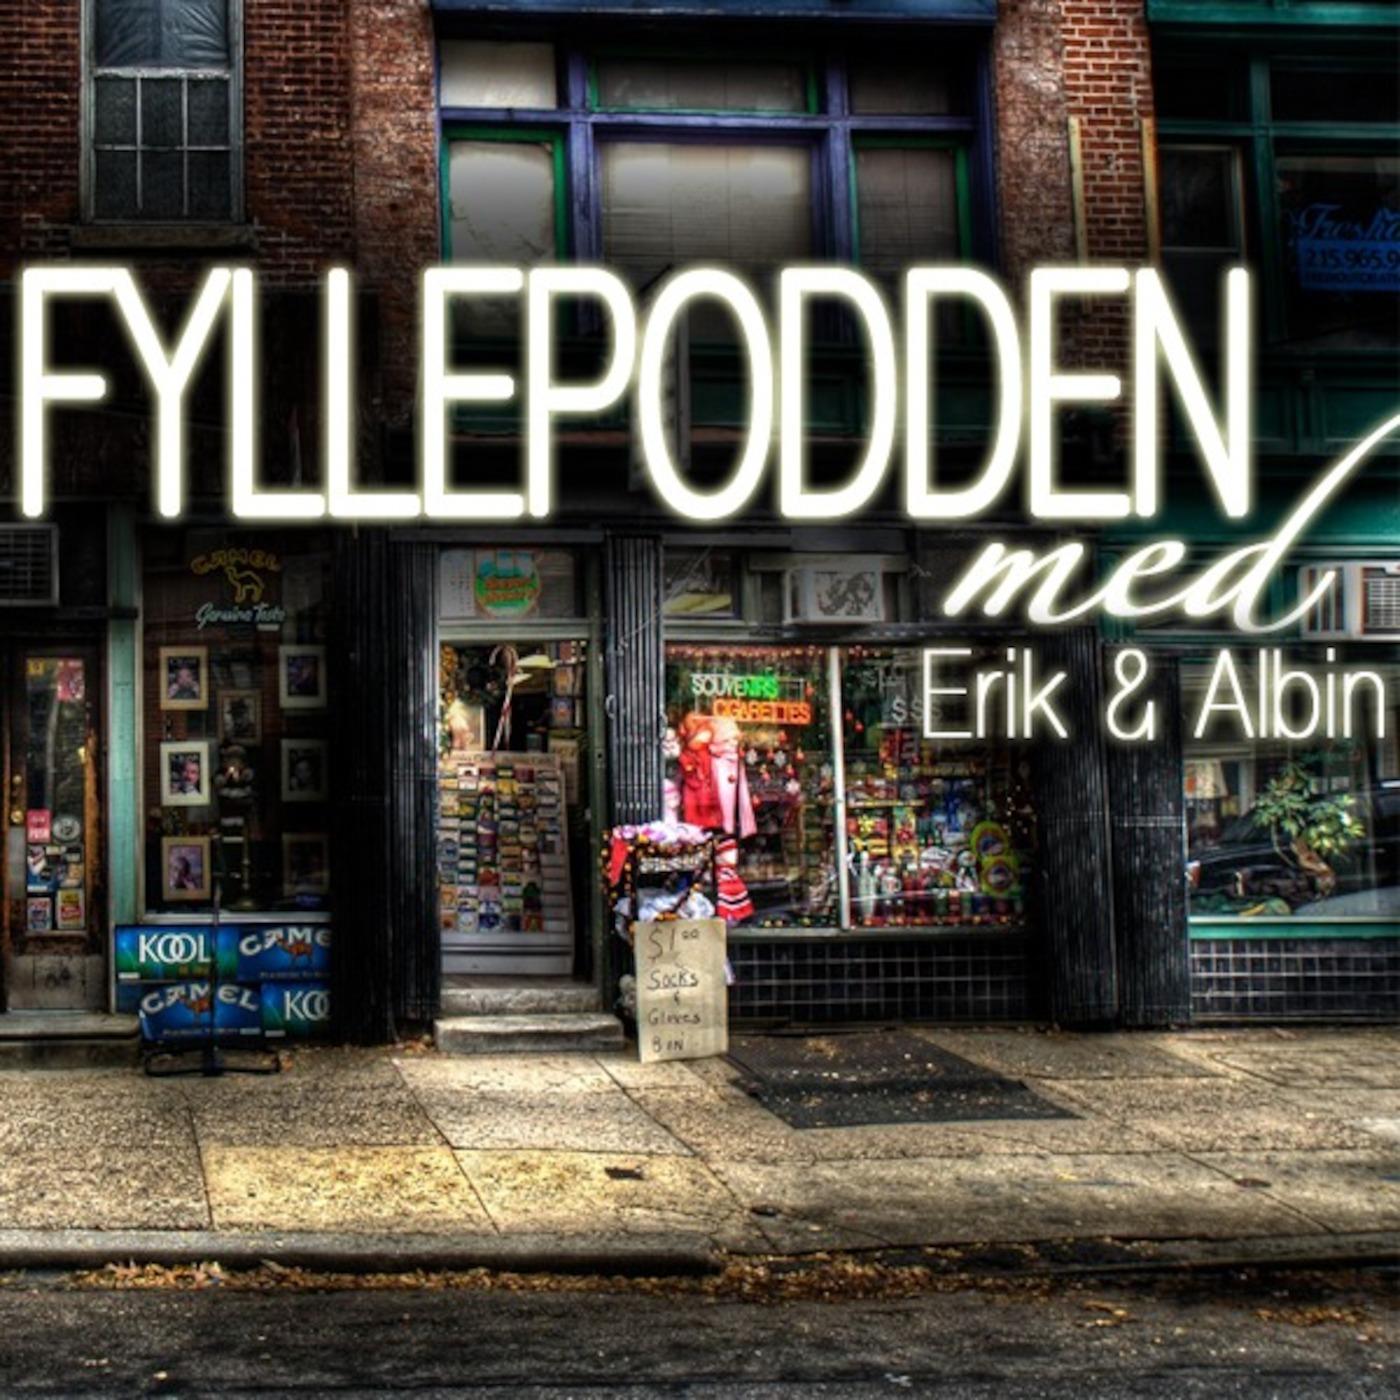 FYLLEPODDEN